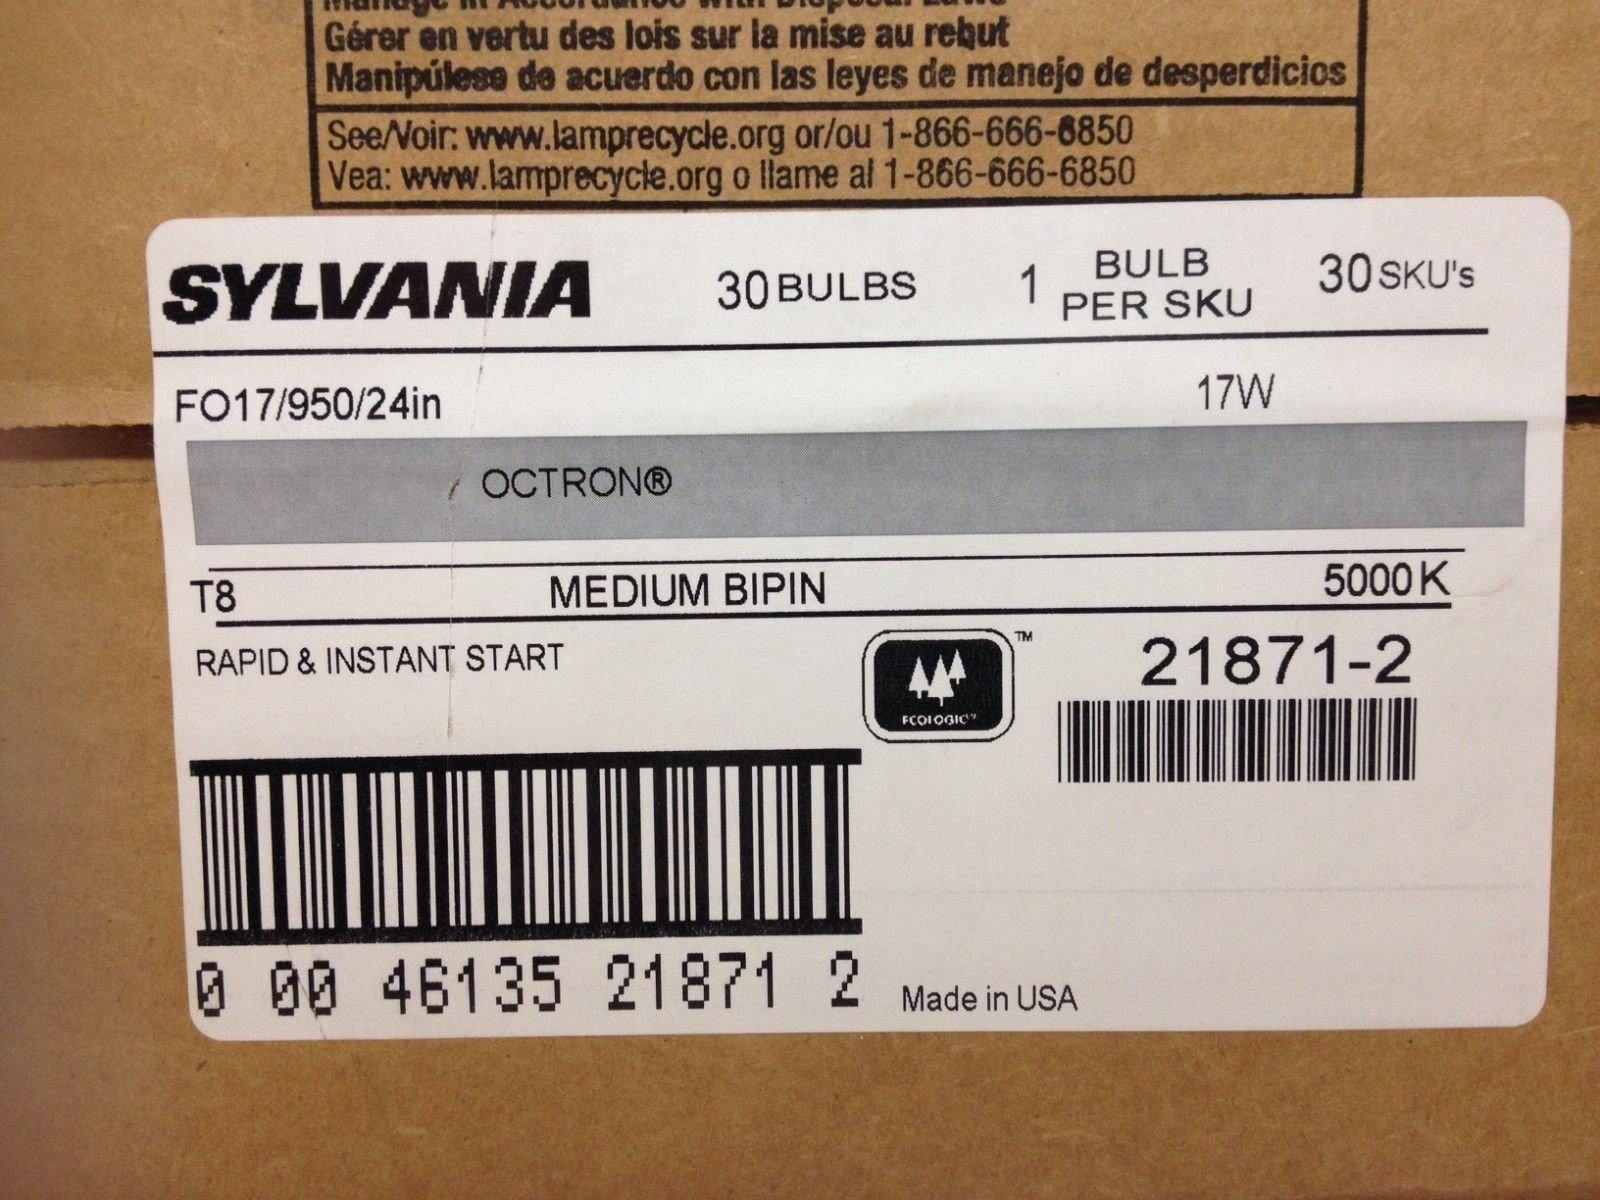 30 Sylvania 21871 FO17/950/24in 17W T8 5000K Medium Bipin Rapid Instant Start